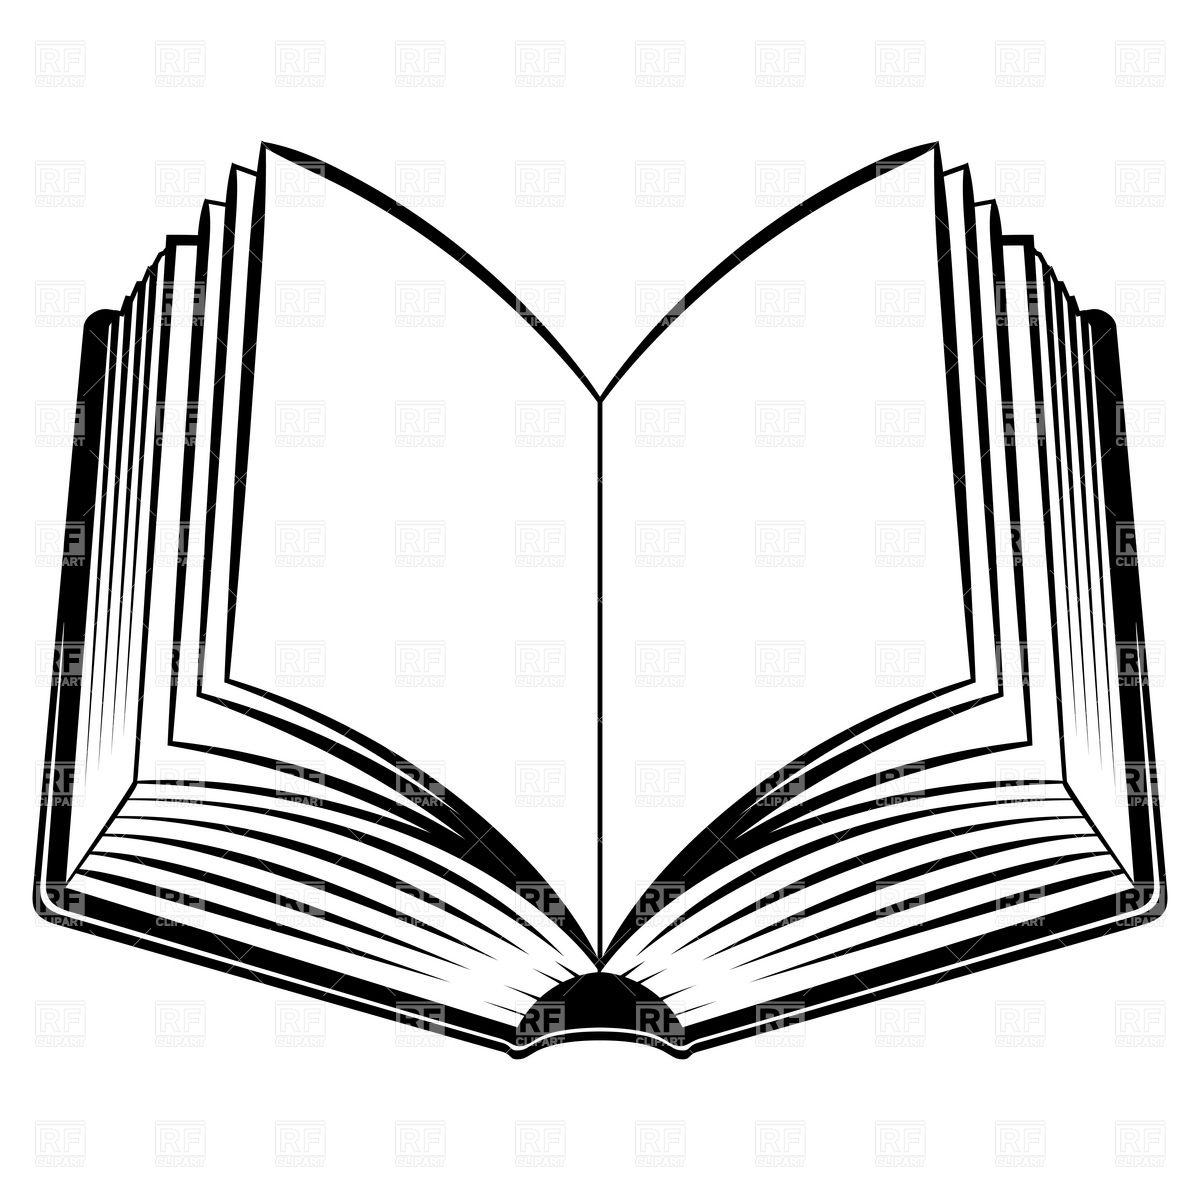 1200x1200 Simple Open Book Royalty Free Vector Clip Art Image